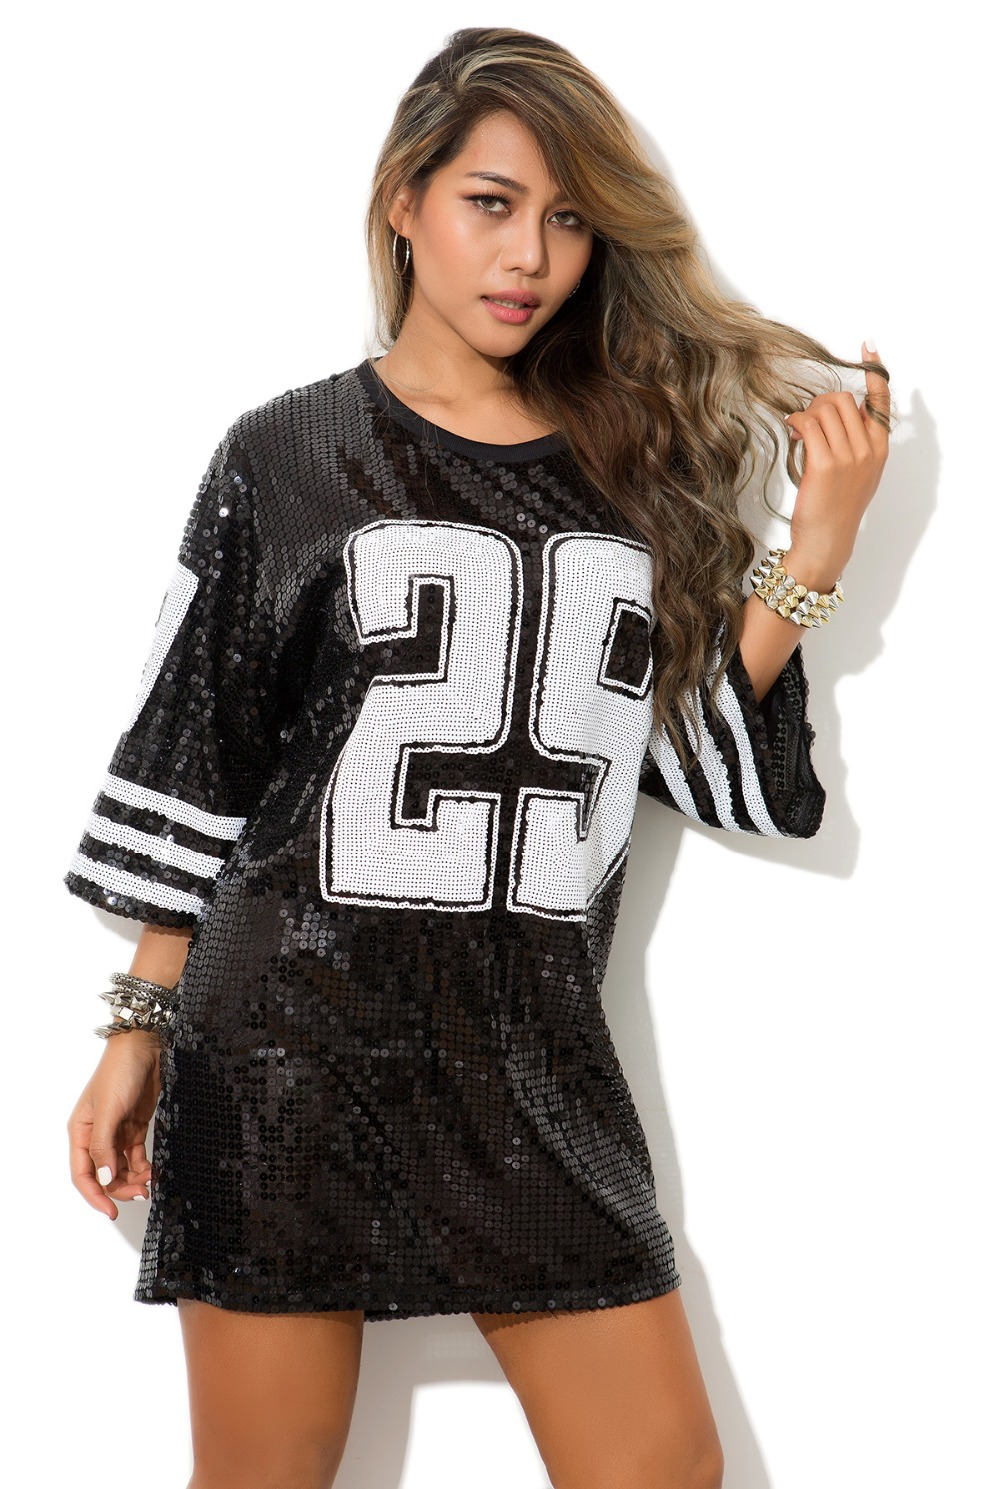 21 Party Dress